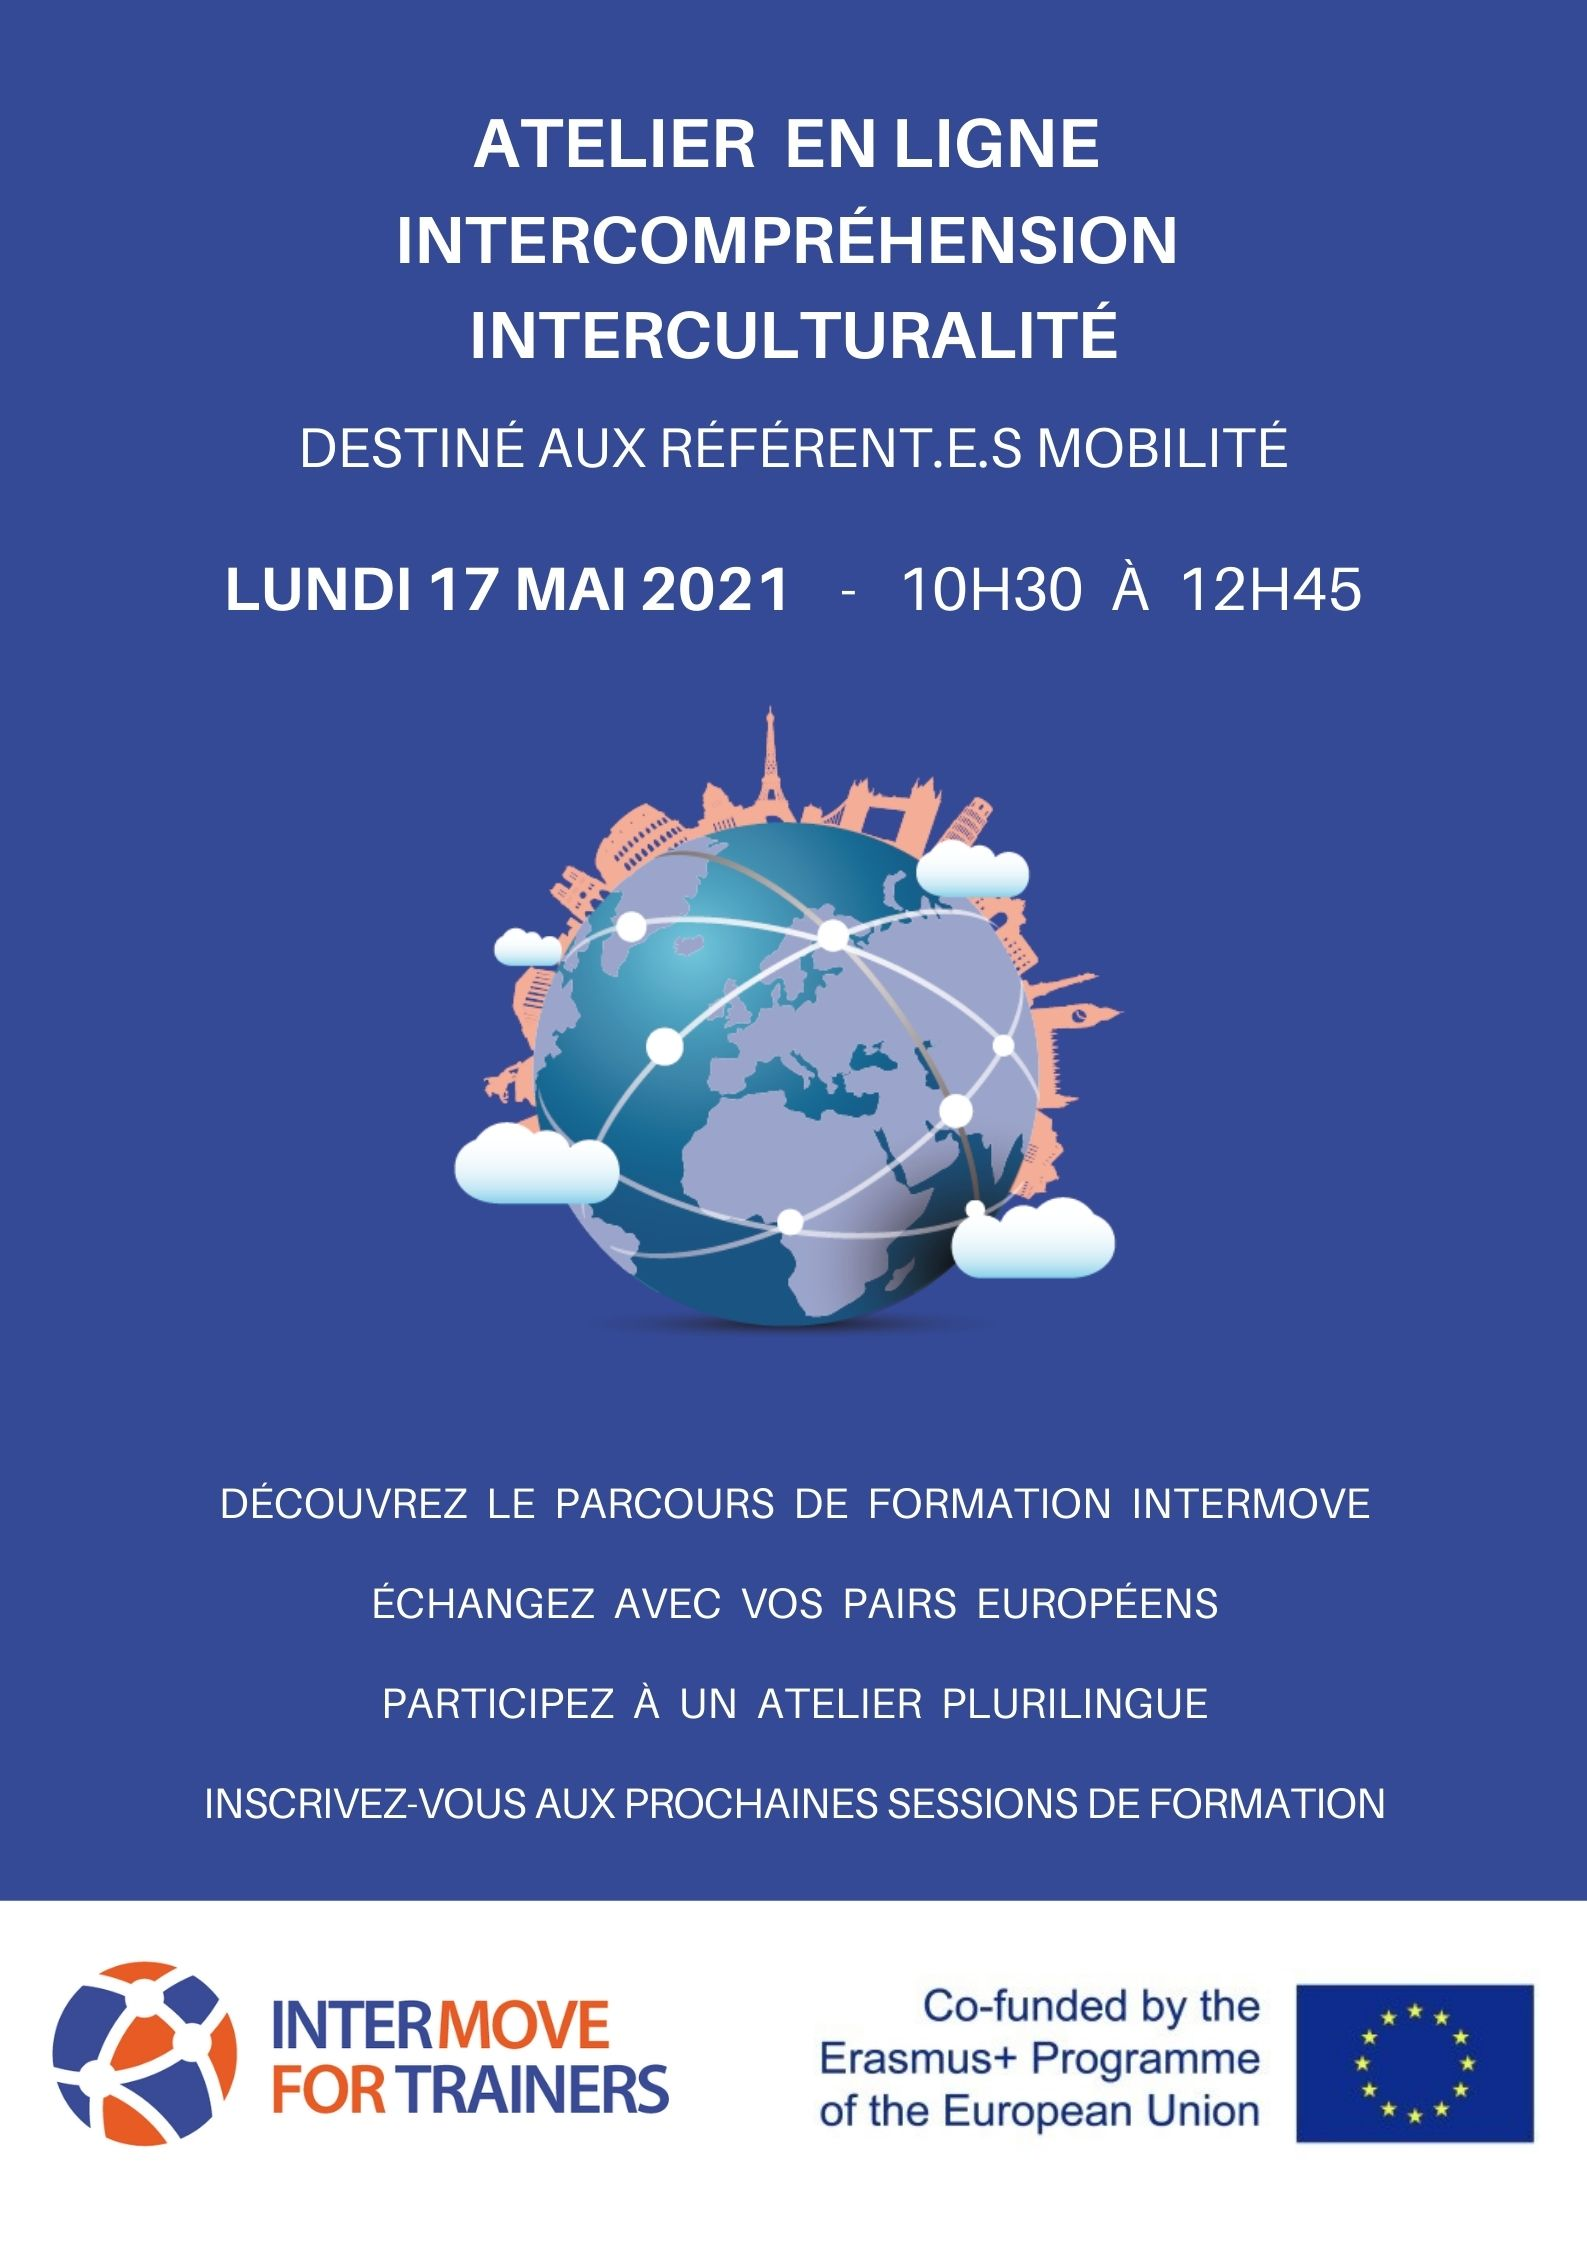 intermove for trainers intercompréhension interculturalité interculturelle interculturel odyssée bordeaux france